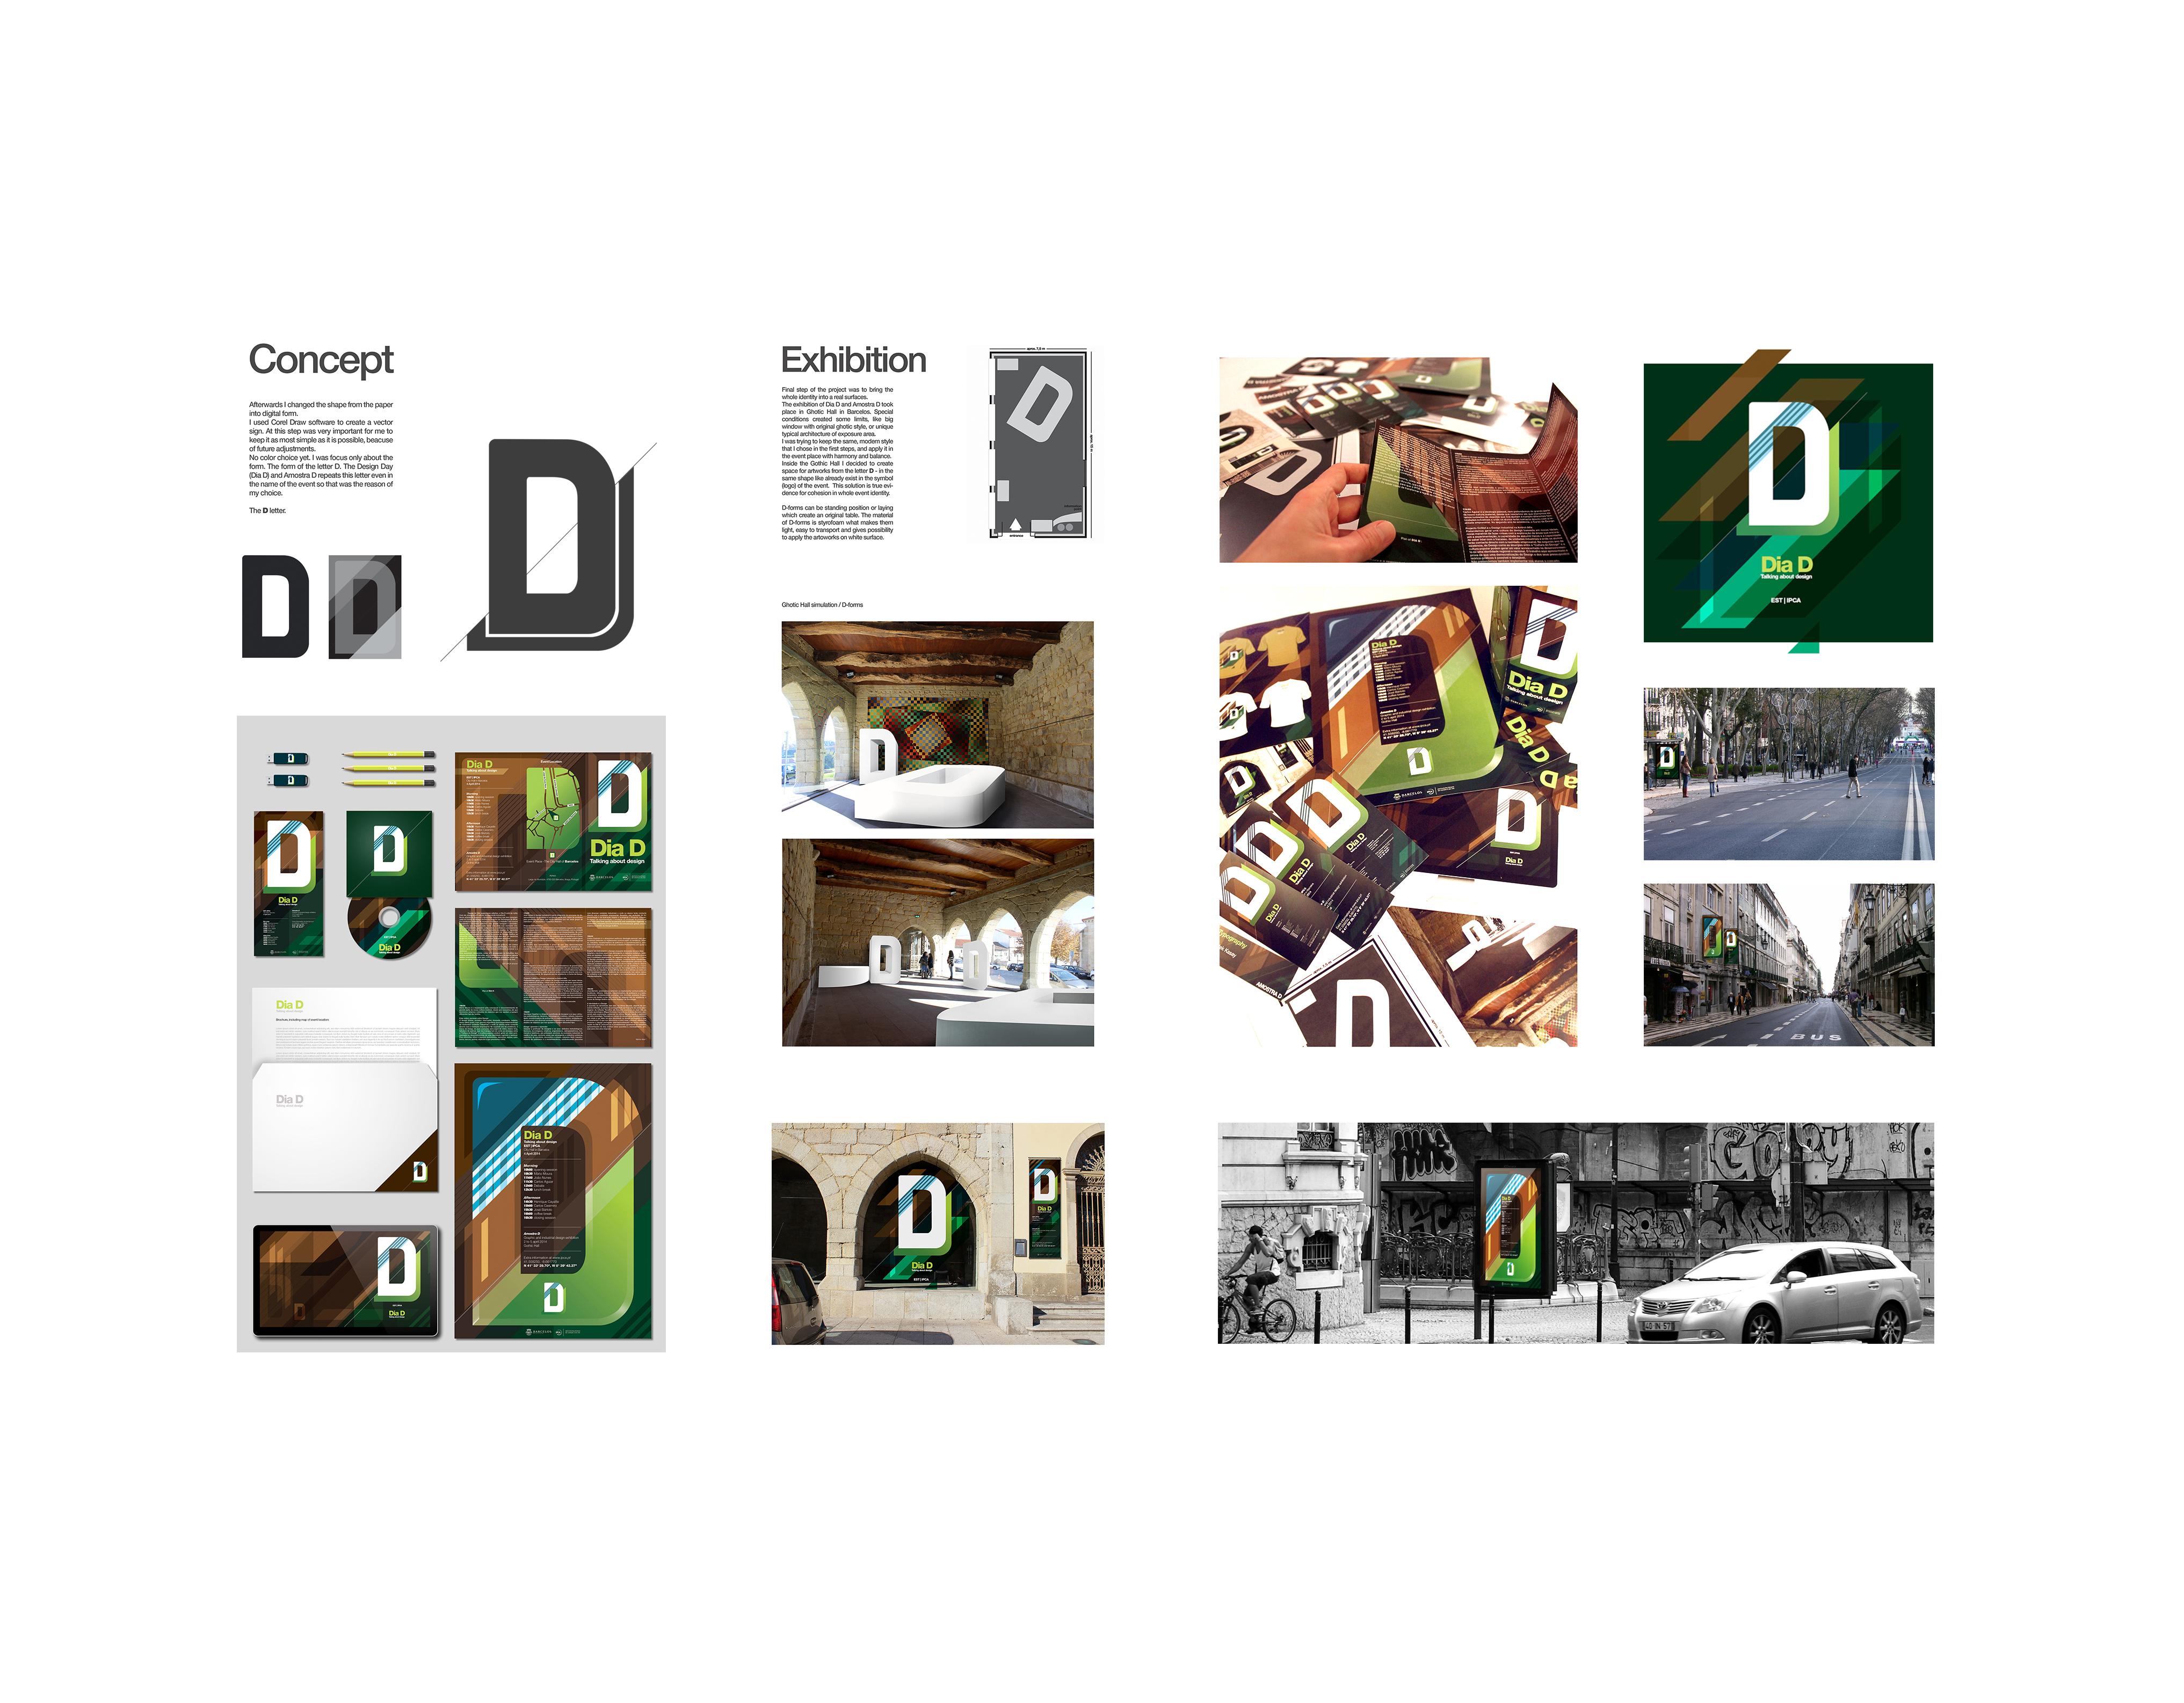 DIA D - Event Identity System